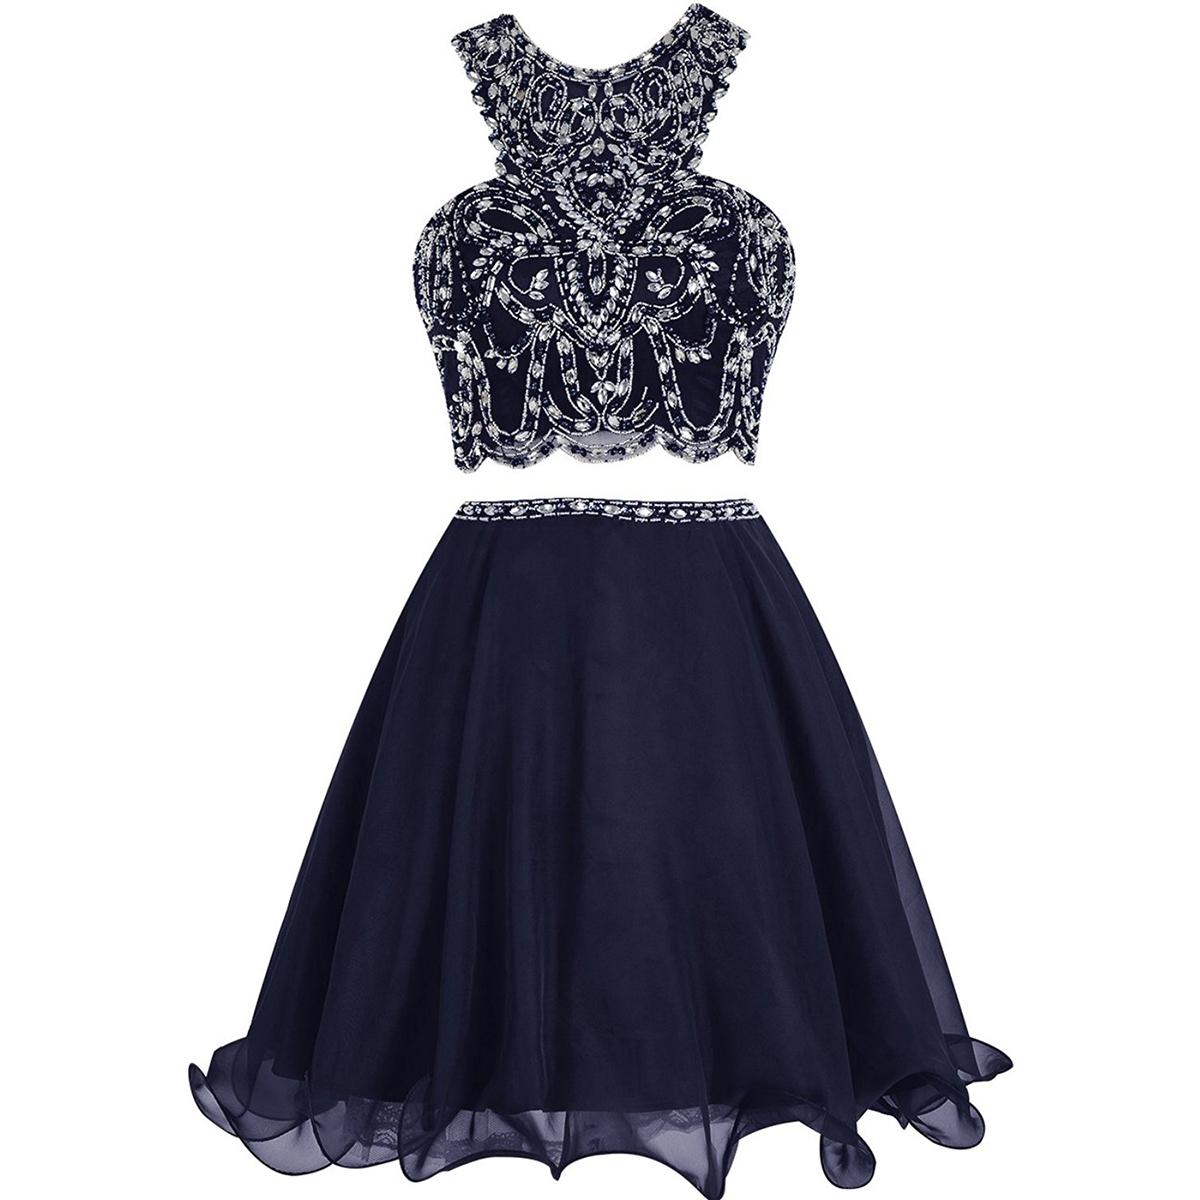 27218f89e05c Jewel Neck Two Piece Short Beaded Prom Dress